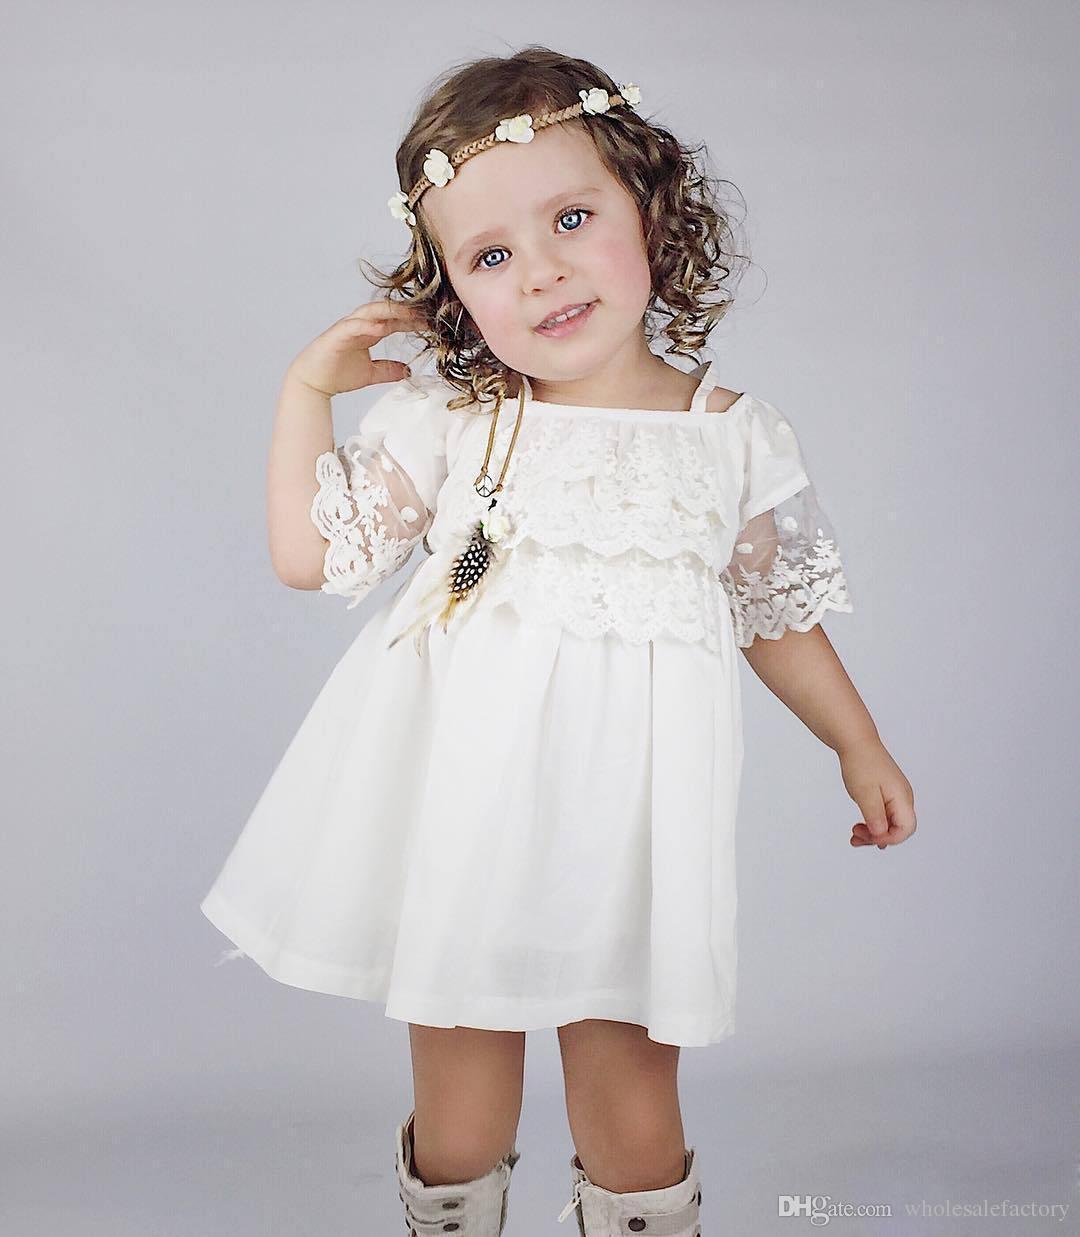 Barato País Bonito Flor Meninas Vestidos Para O Bebê Cintas de Espaguete Lace Curto Vestidos de Festa de Casamento Para Little Kids Online Sale